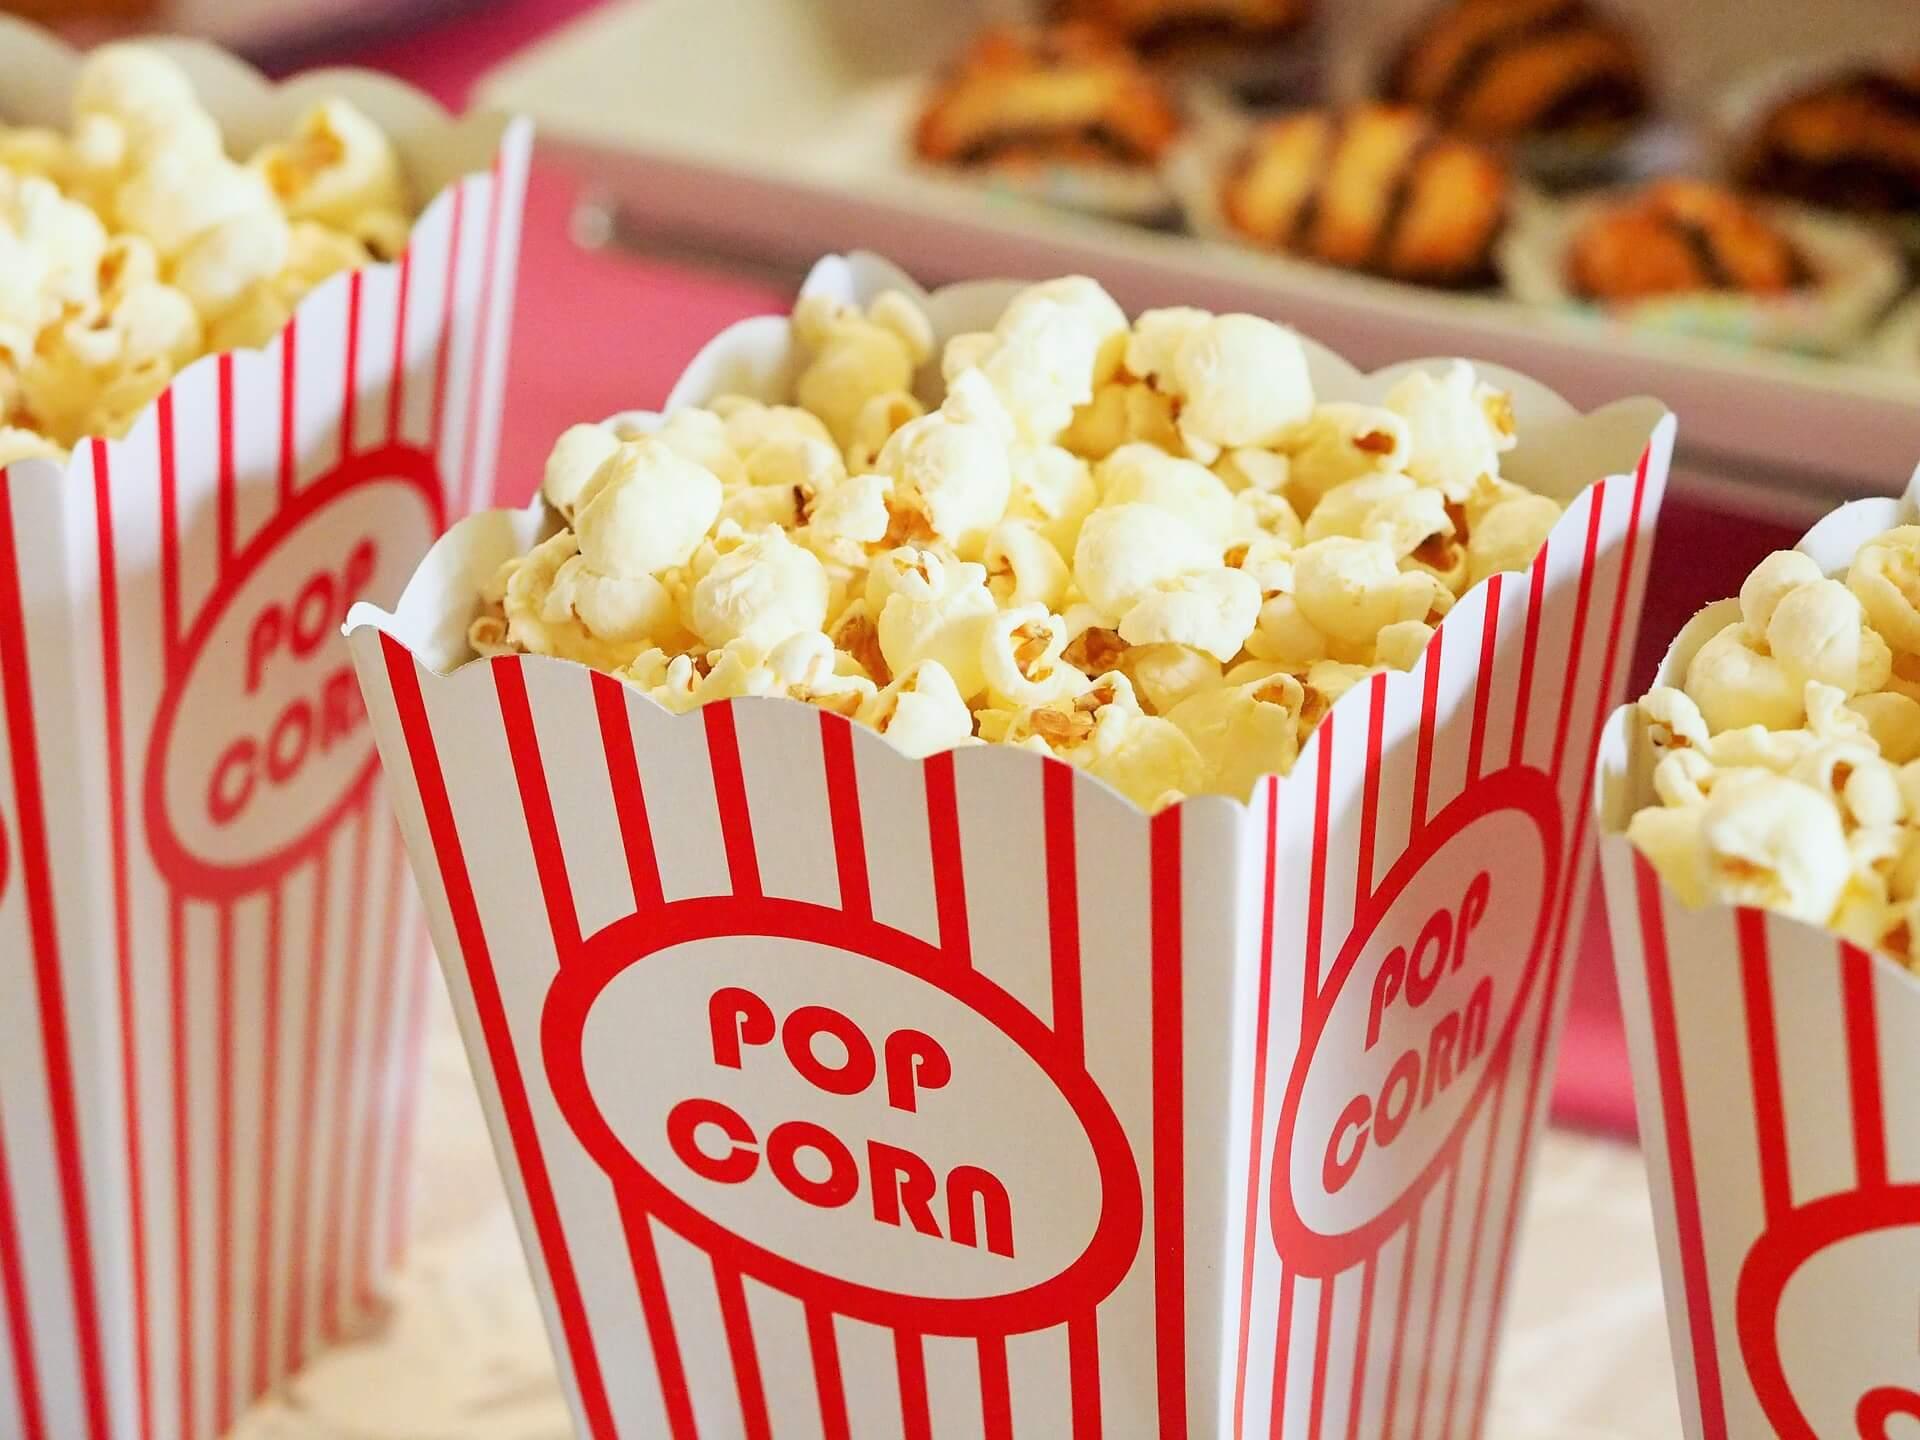 popcorn movie4k kinox